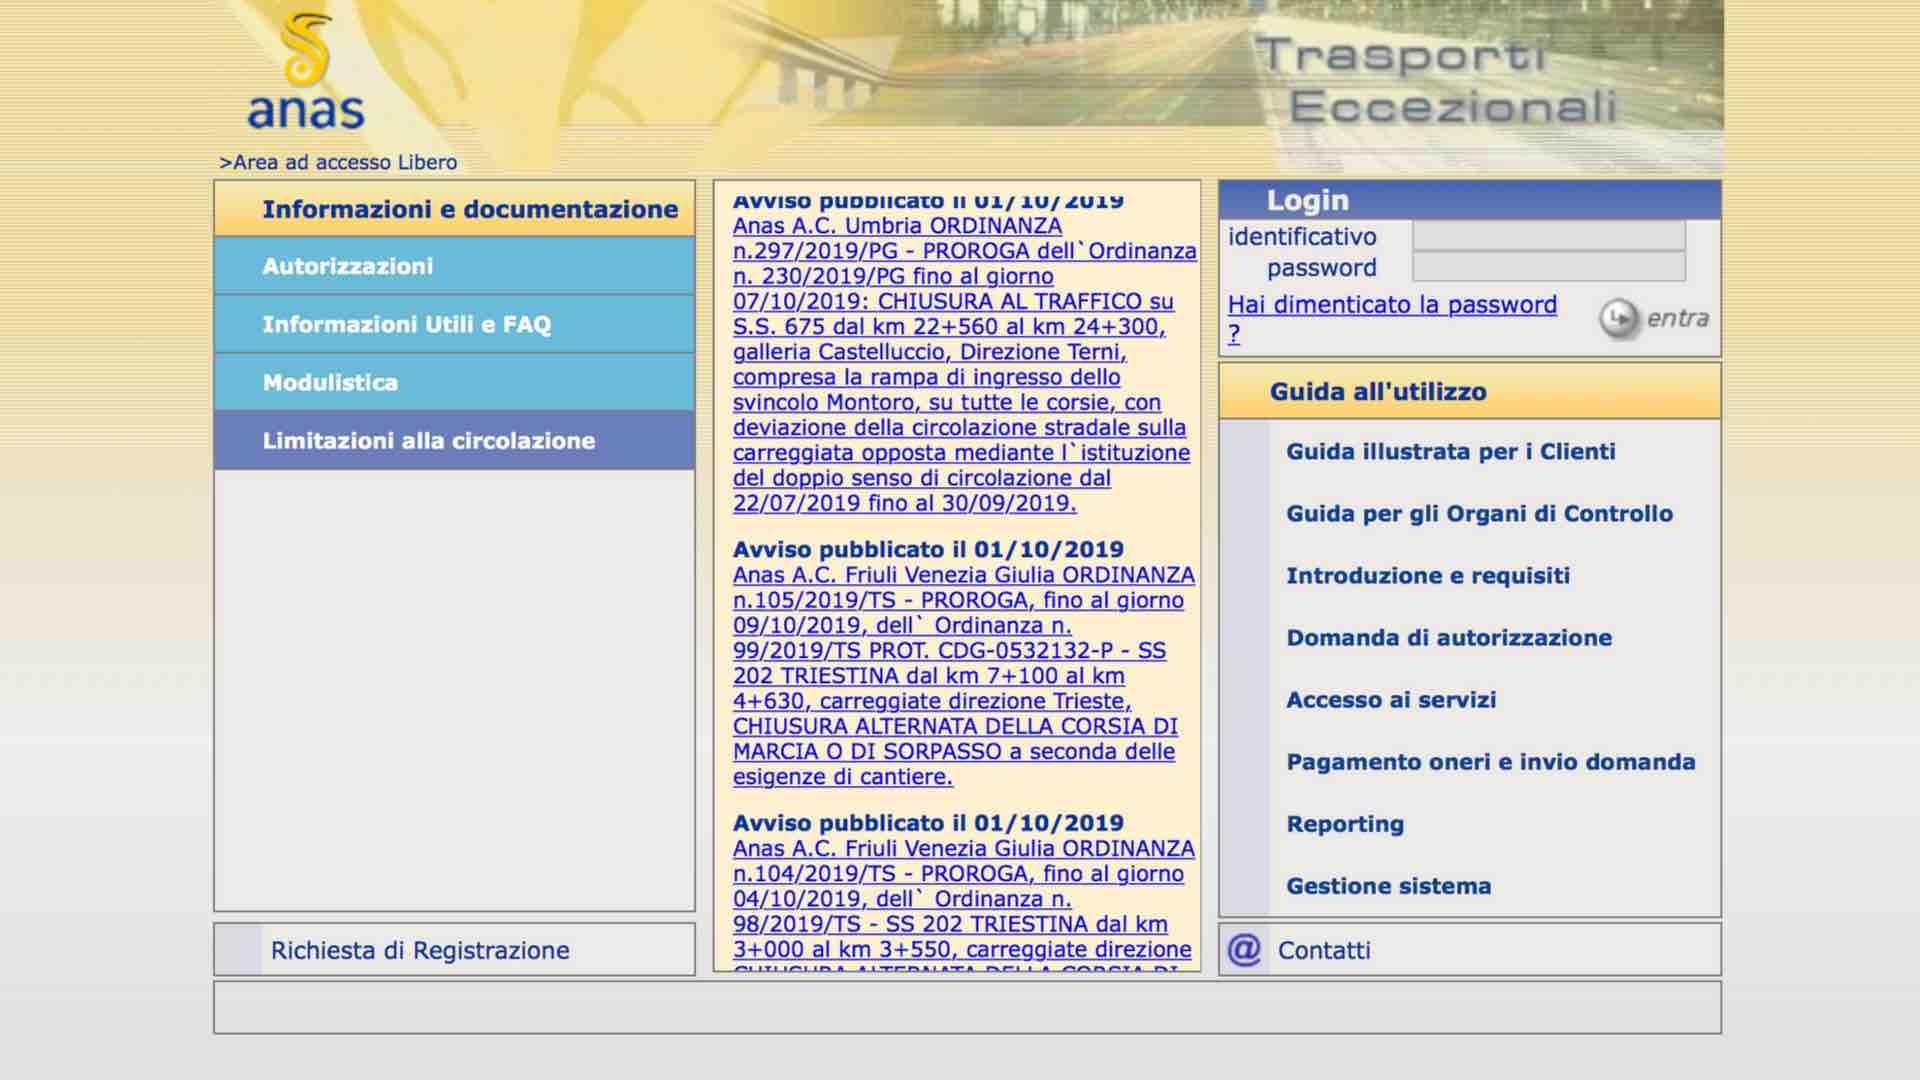 FIAP Trasporti Eccezionali Restyling Piattaforma TEWEB